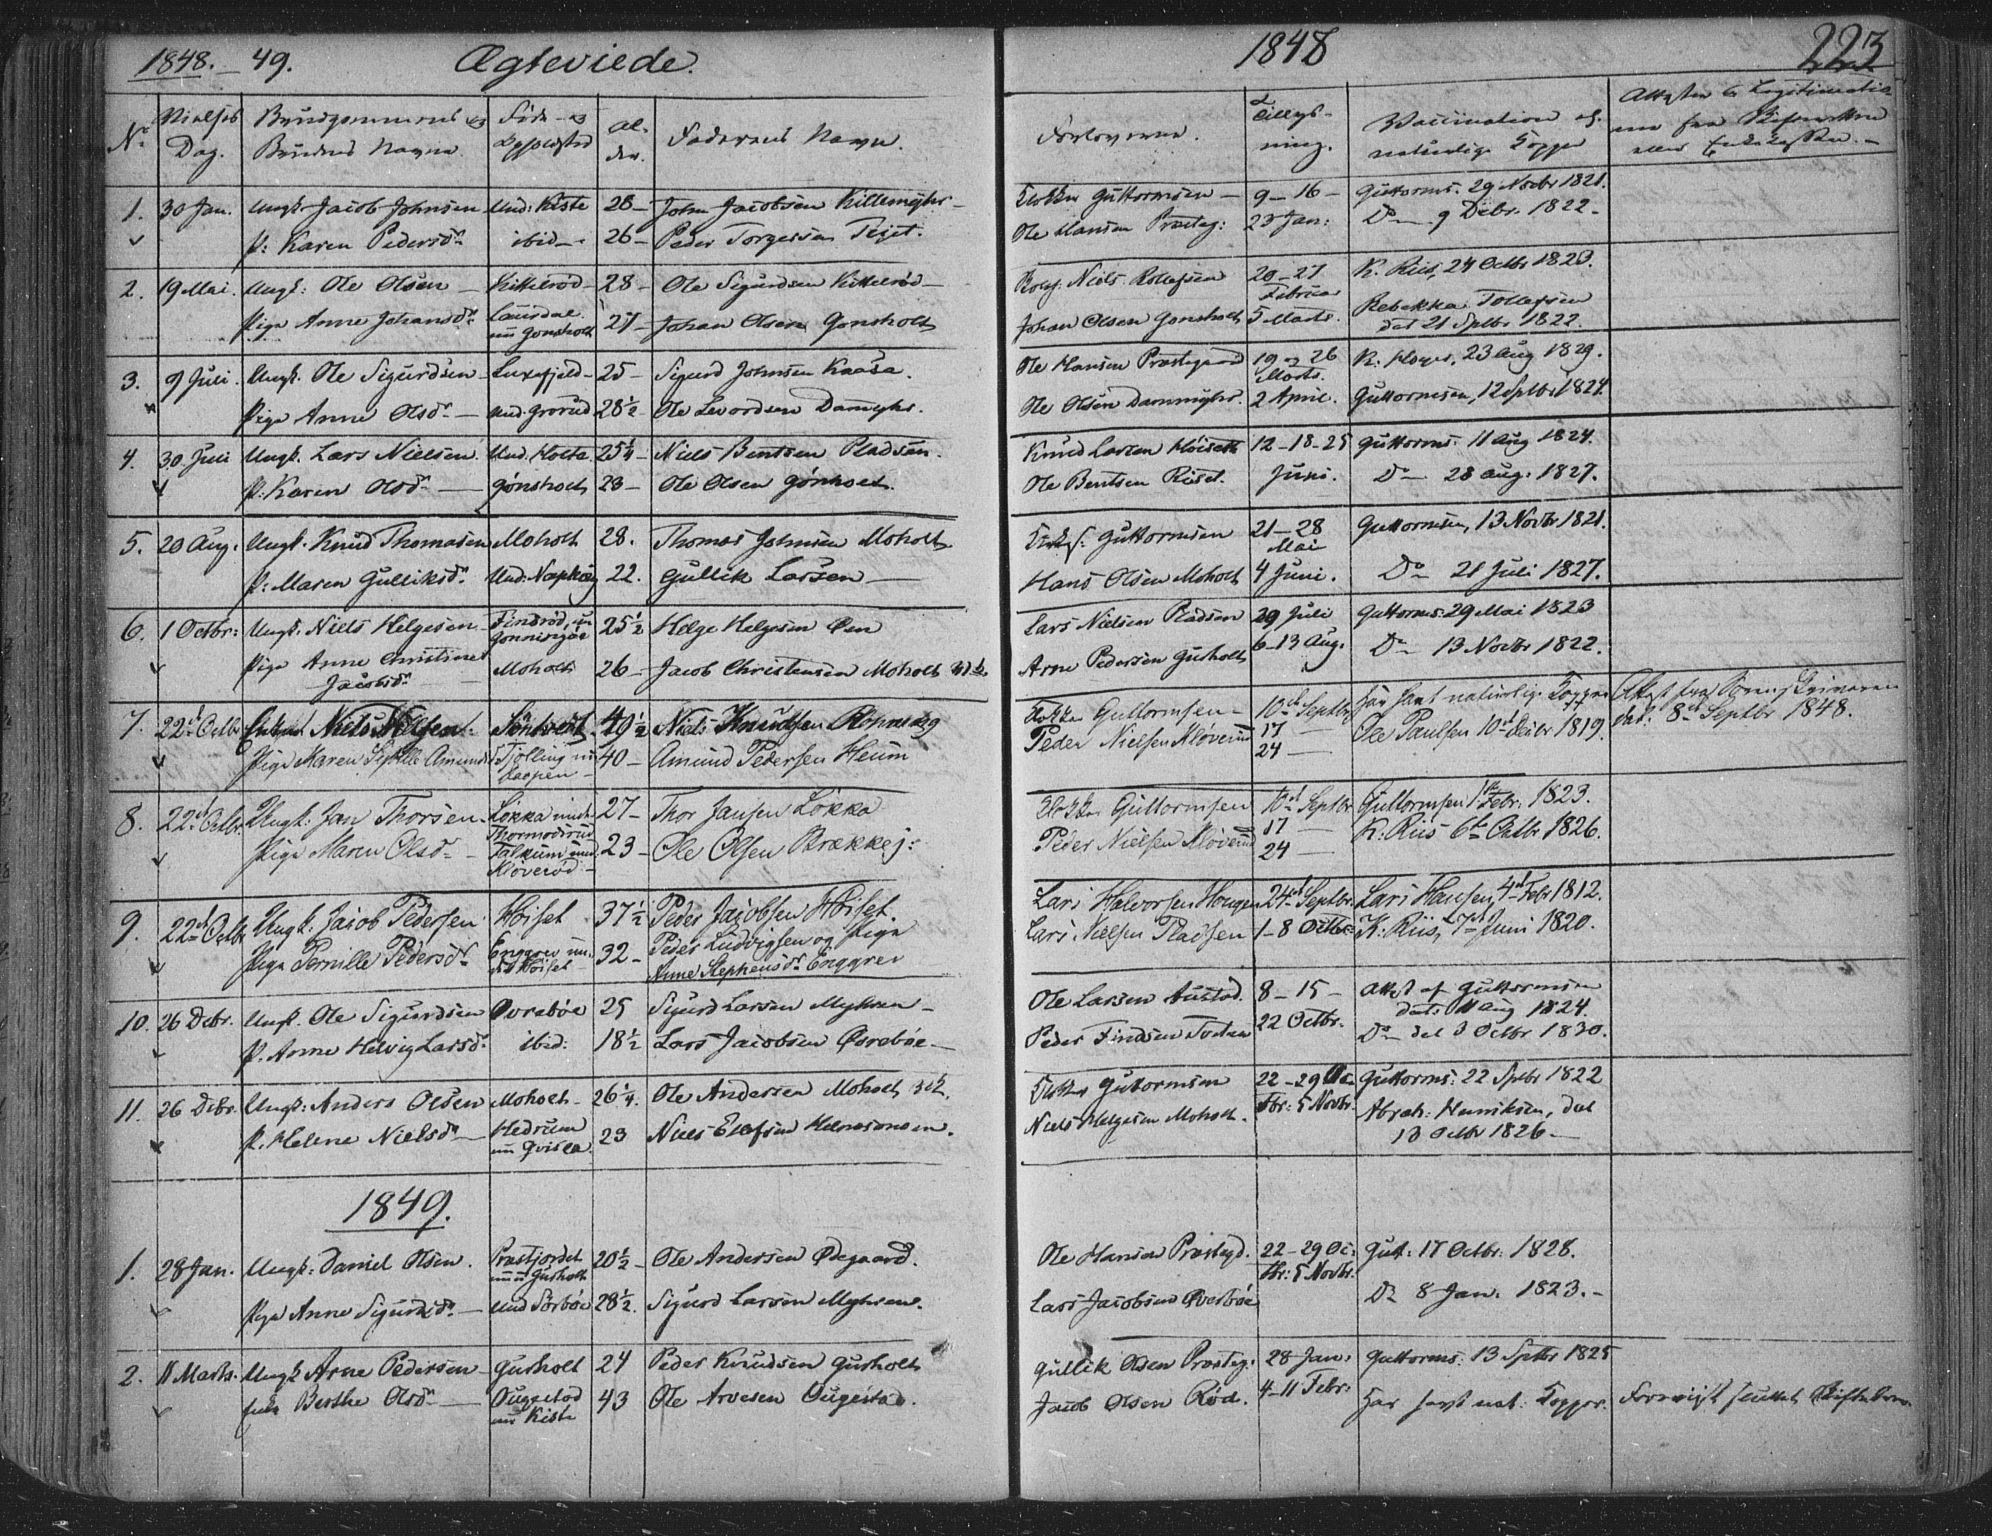 SAKO, Siljan kirkebøker, F/Fa/L0001: Parish register (official) no. 1, 1831-1870, p. 223